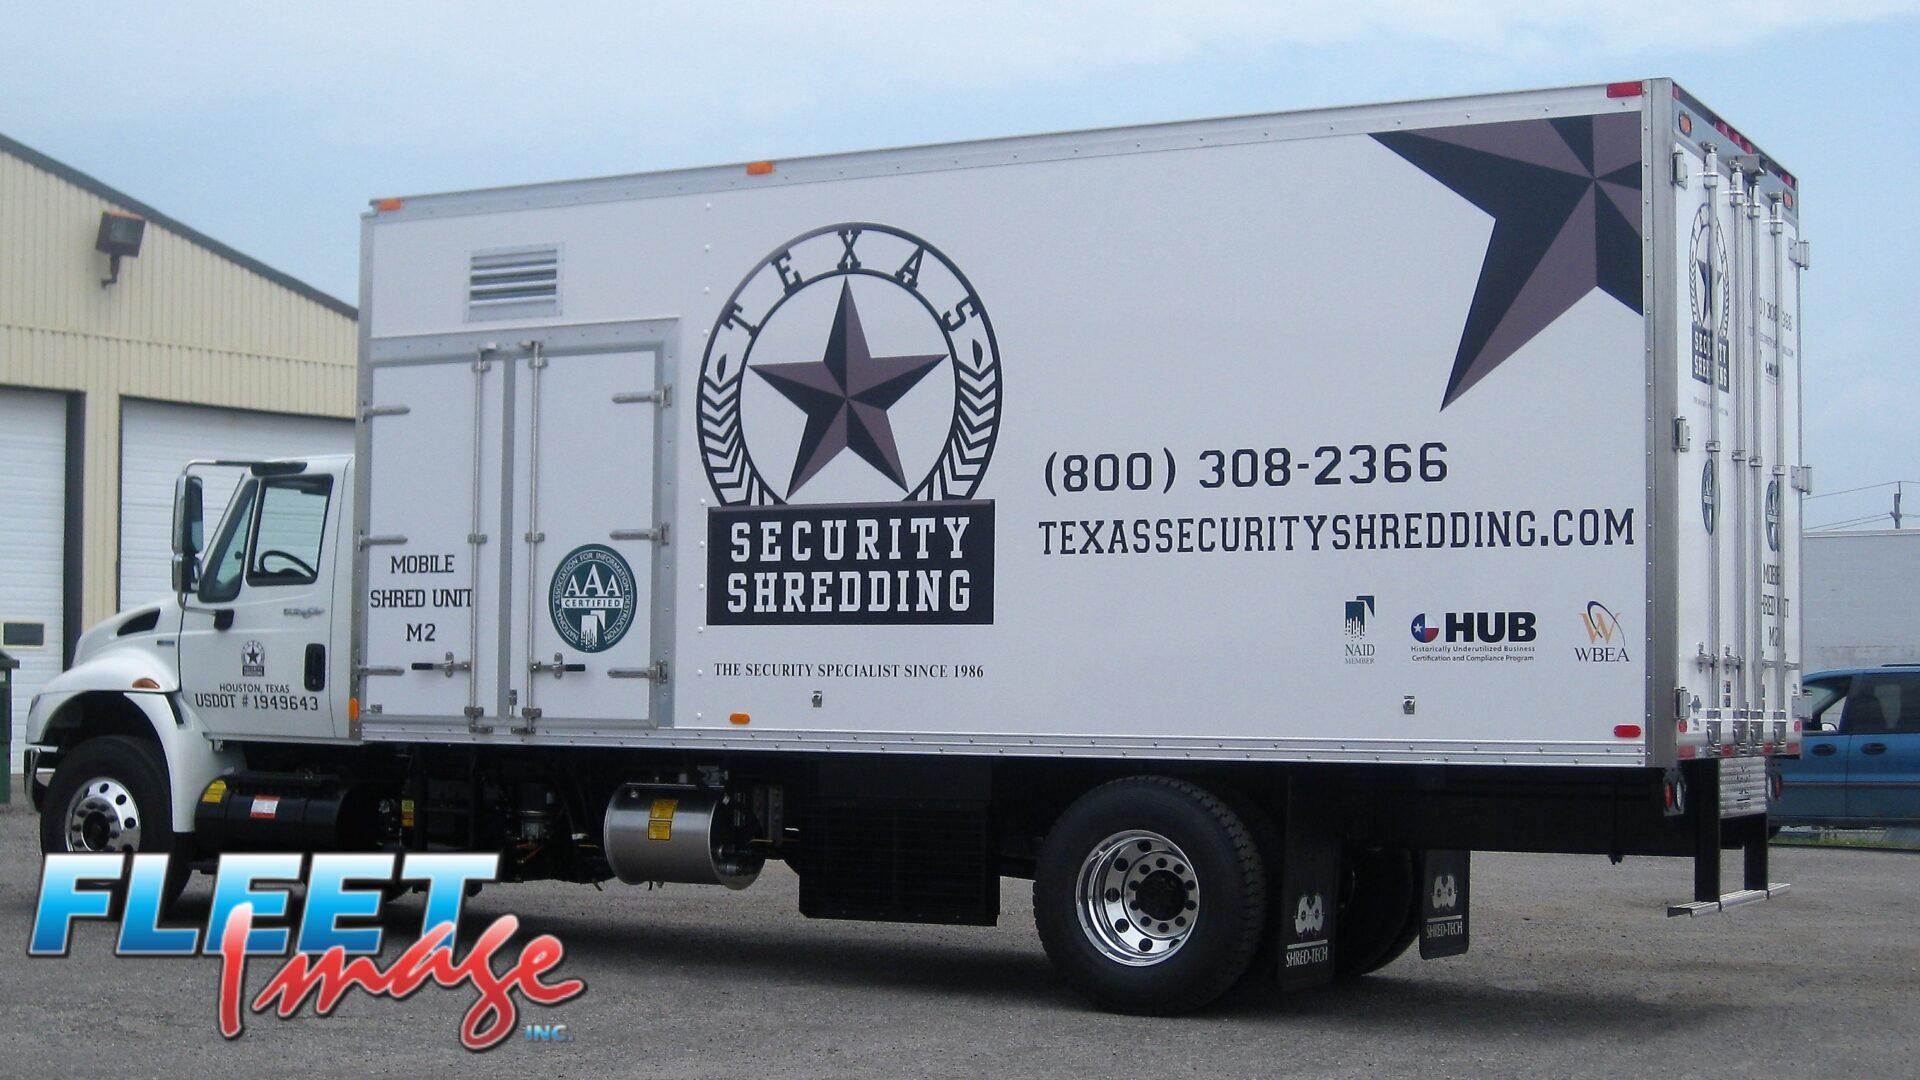 TEXAS SECURITY SHREDDING decal sticker on a truck